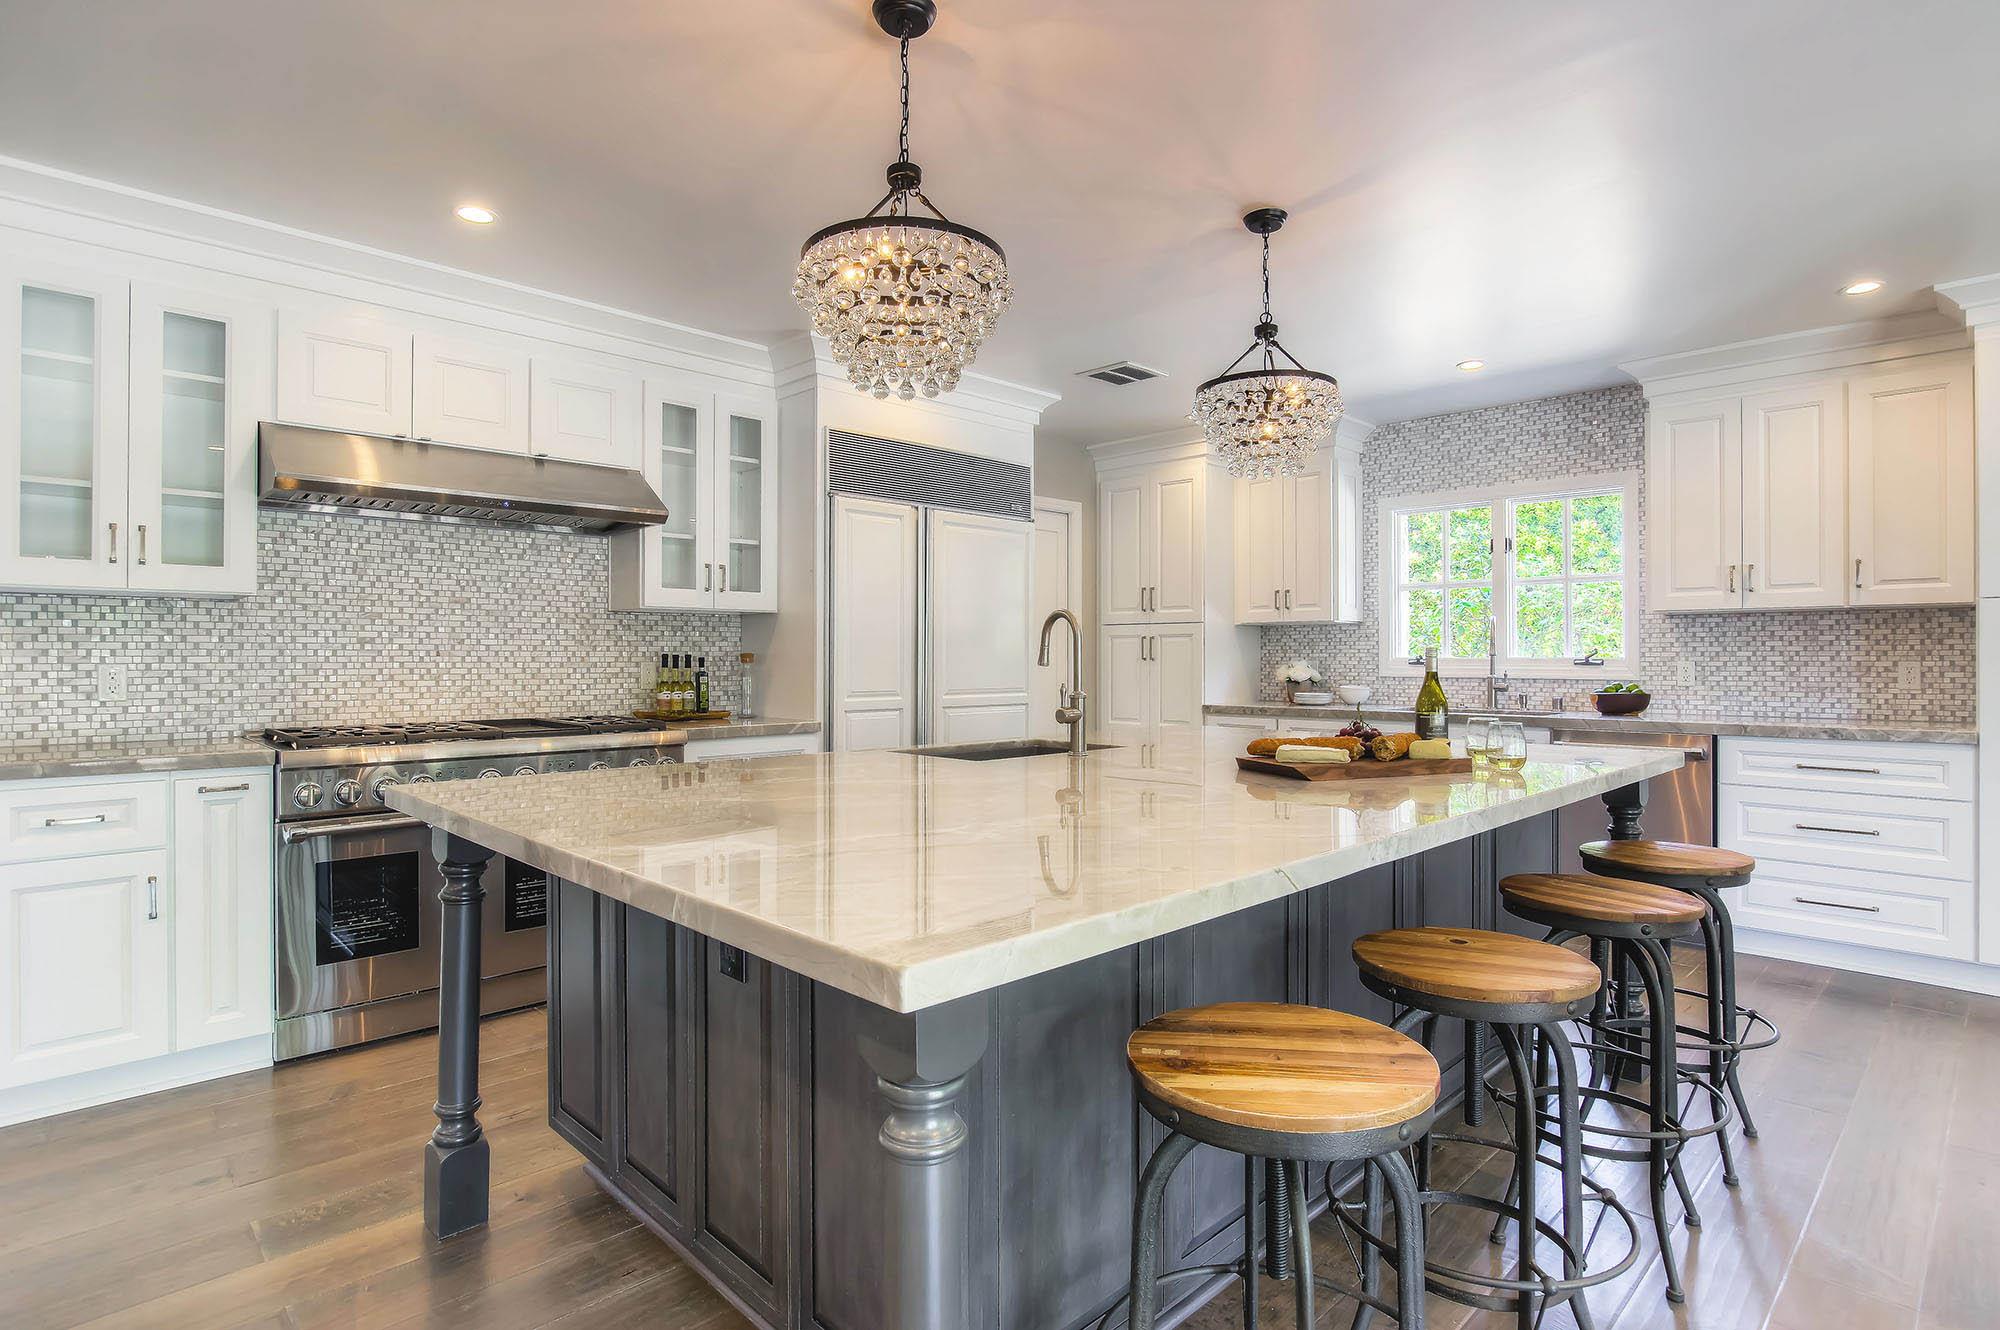 LA_dream_kitchen_remodel_opt.jpg